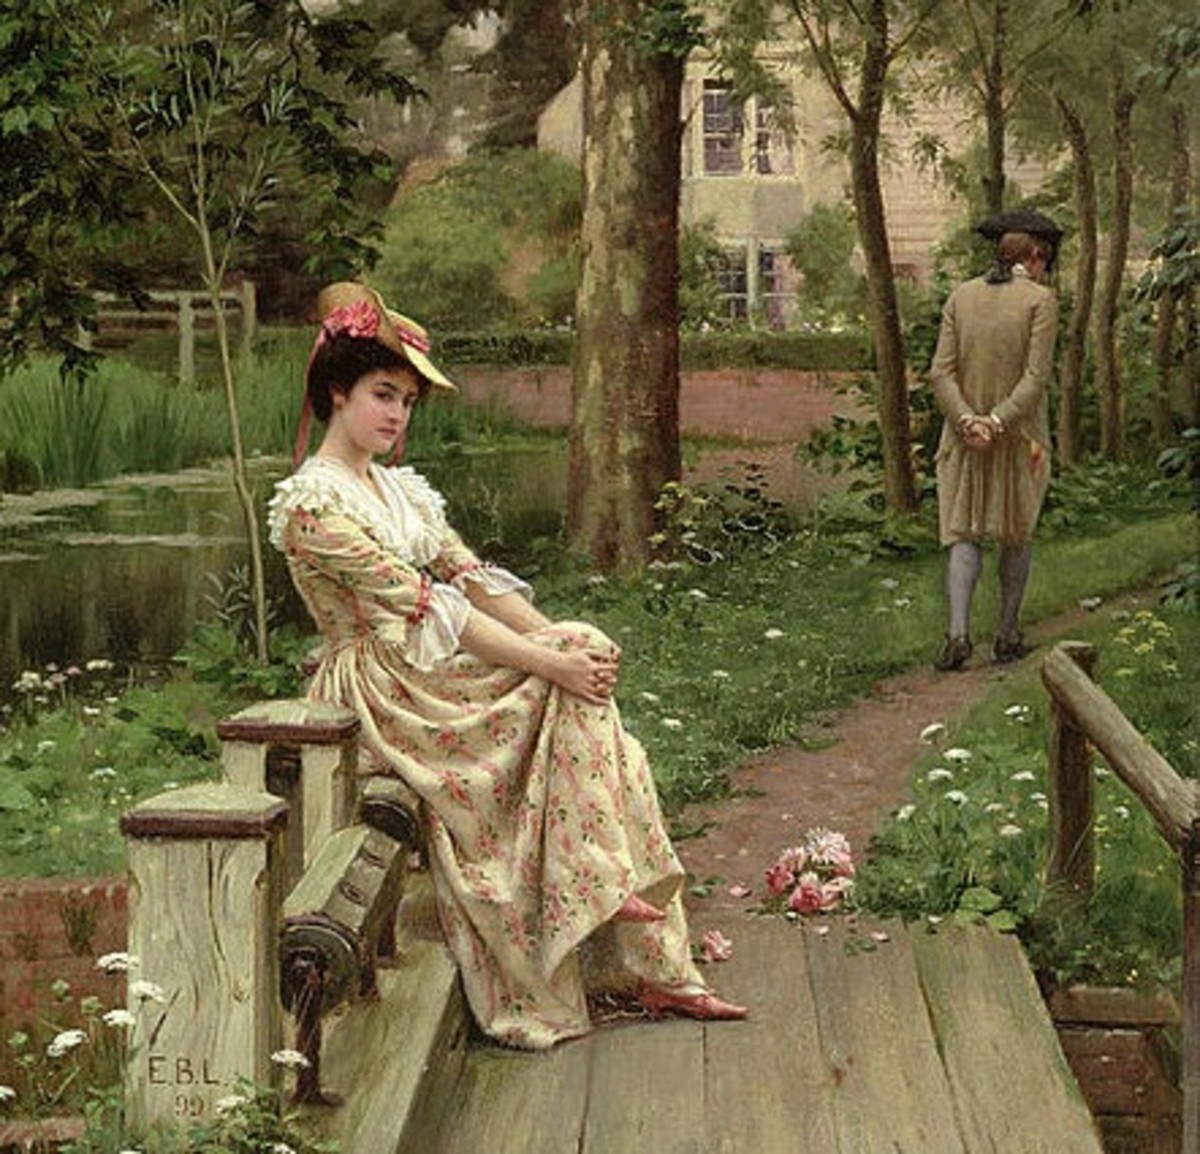 Painting (1900) by Edmund Blair Leighton.  Edited